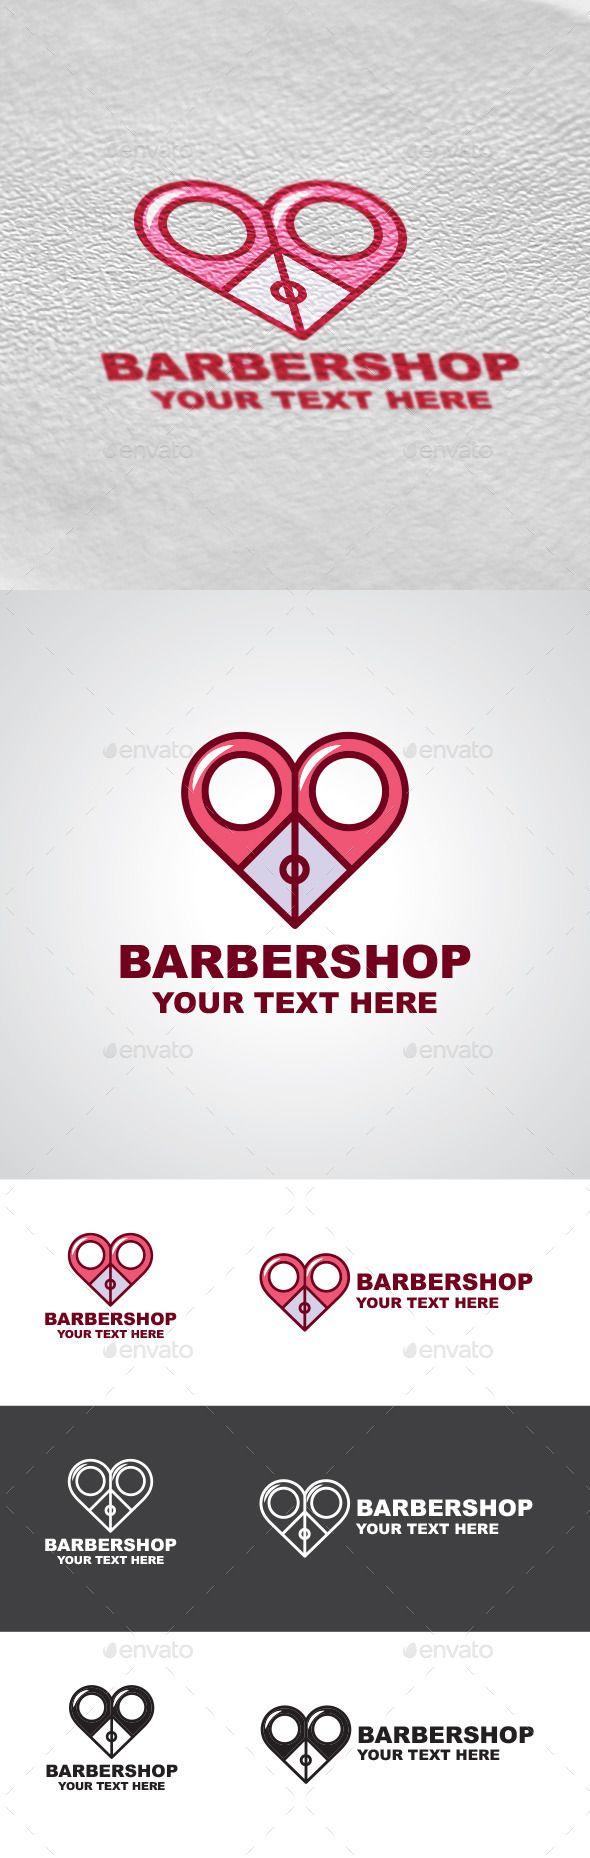 Barbershop Logo Design — Photoshop PSD #haircut #scissors • Available here → https://graphicriver.net/item/barbershop-logo-design/9402986?ref=pxcr